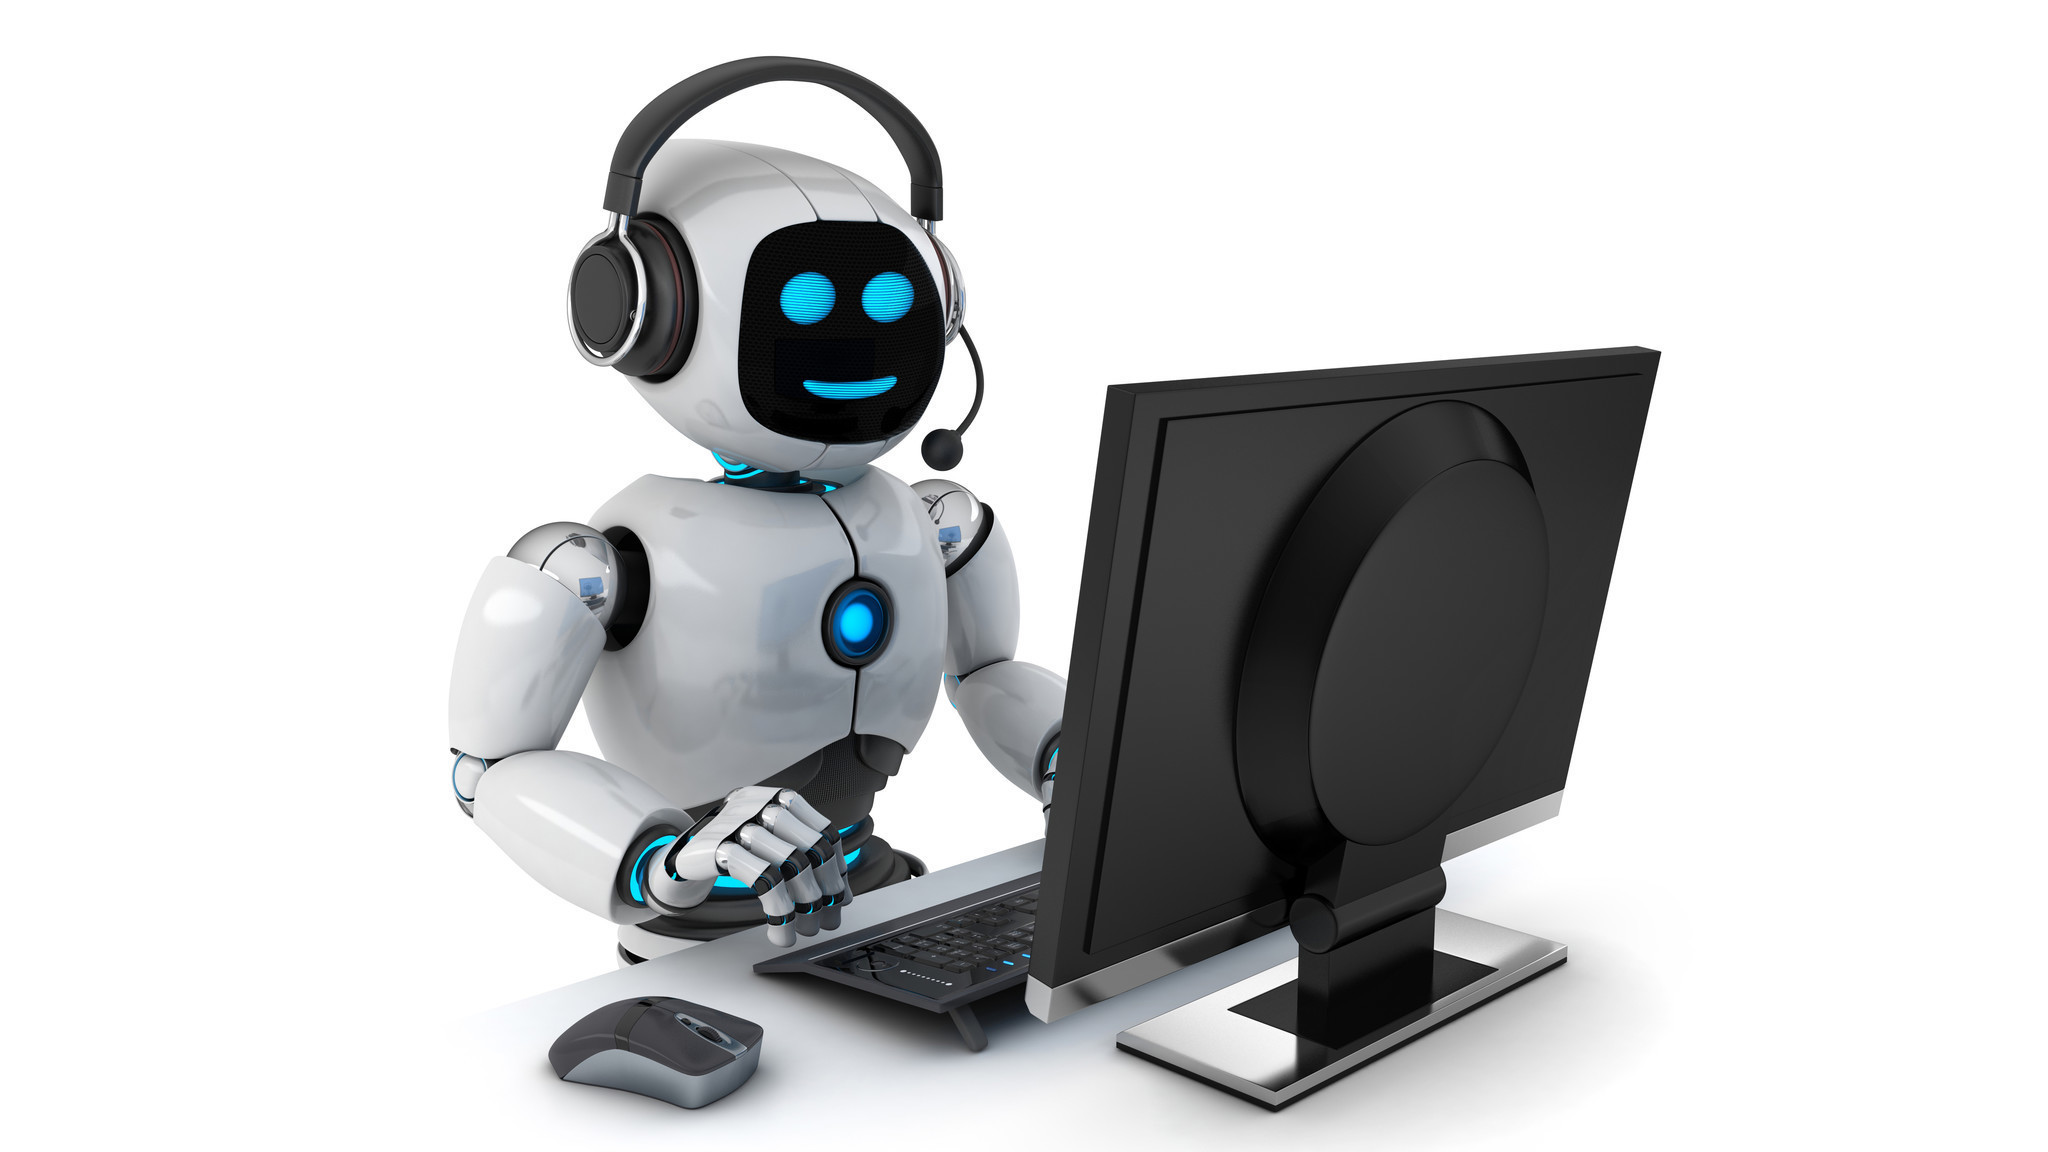 resume matching machine learning